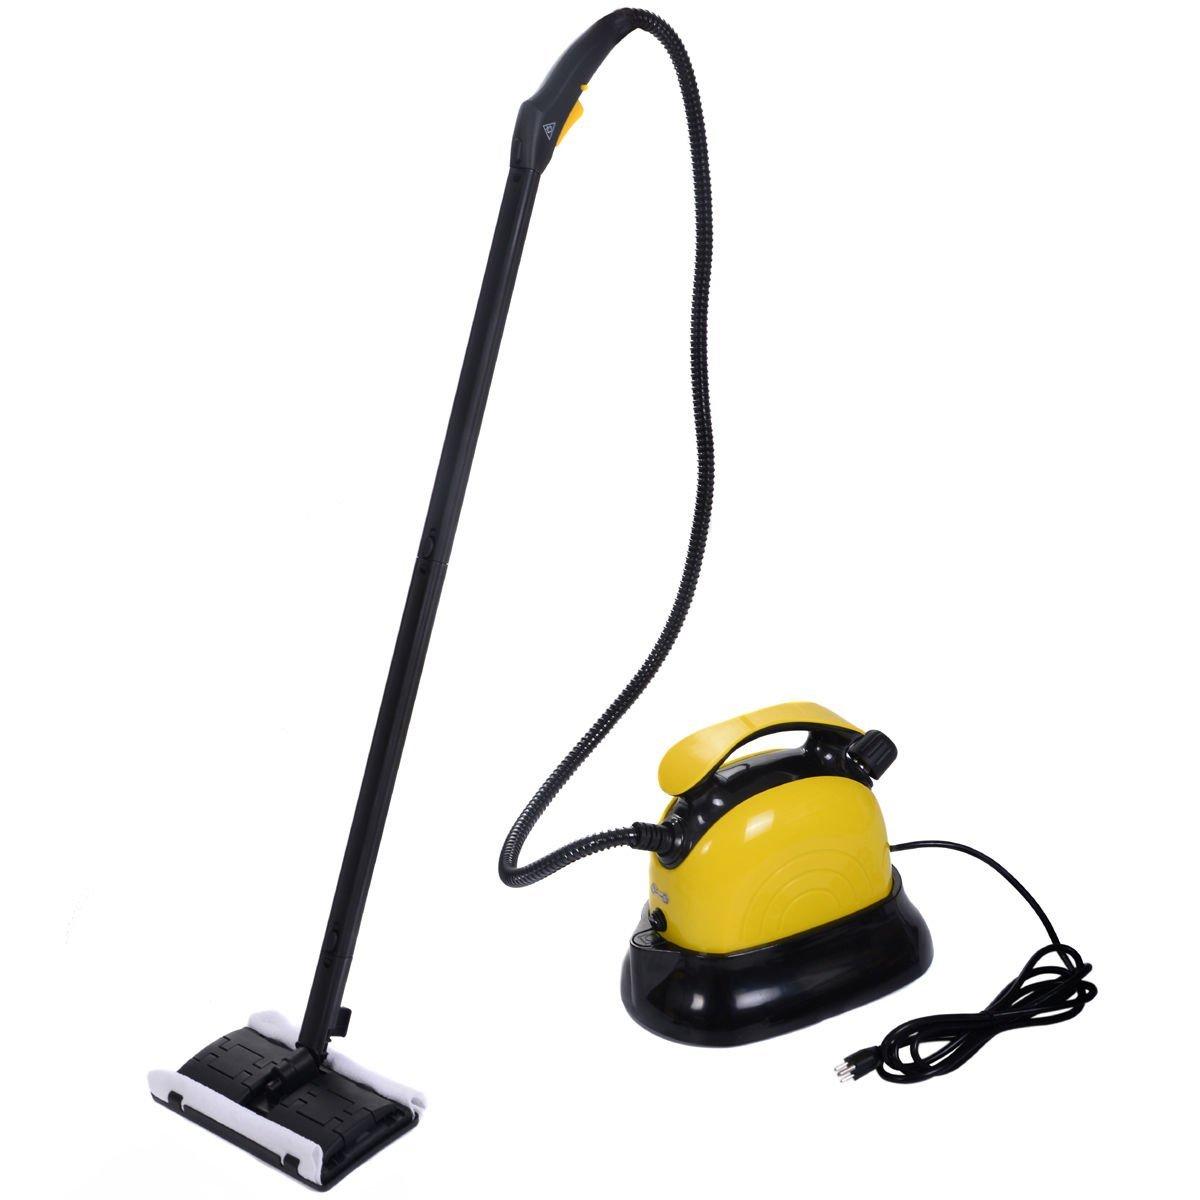 tonyang 1500W Portable Multi Purpose Pressure Steam Cleaner Multifunction Household Carpet Bathroom